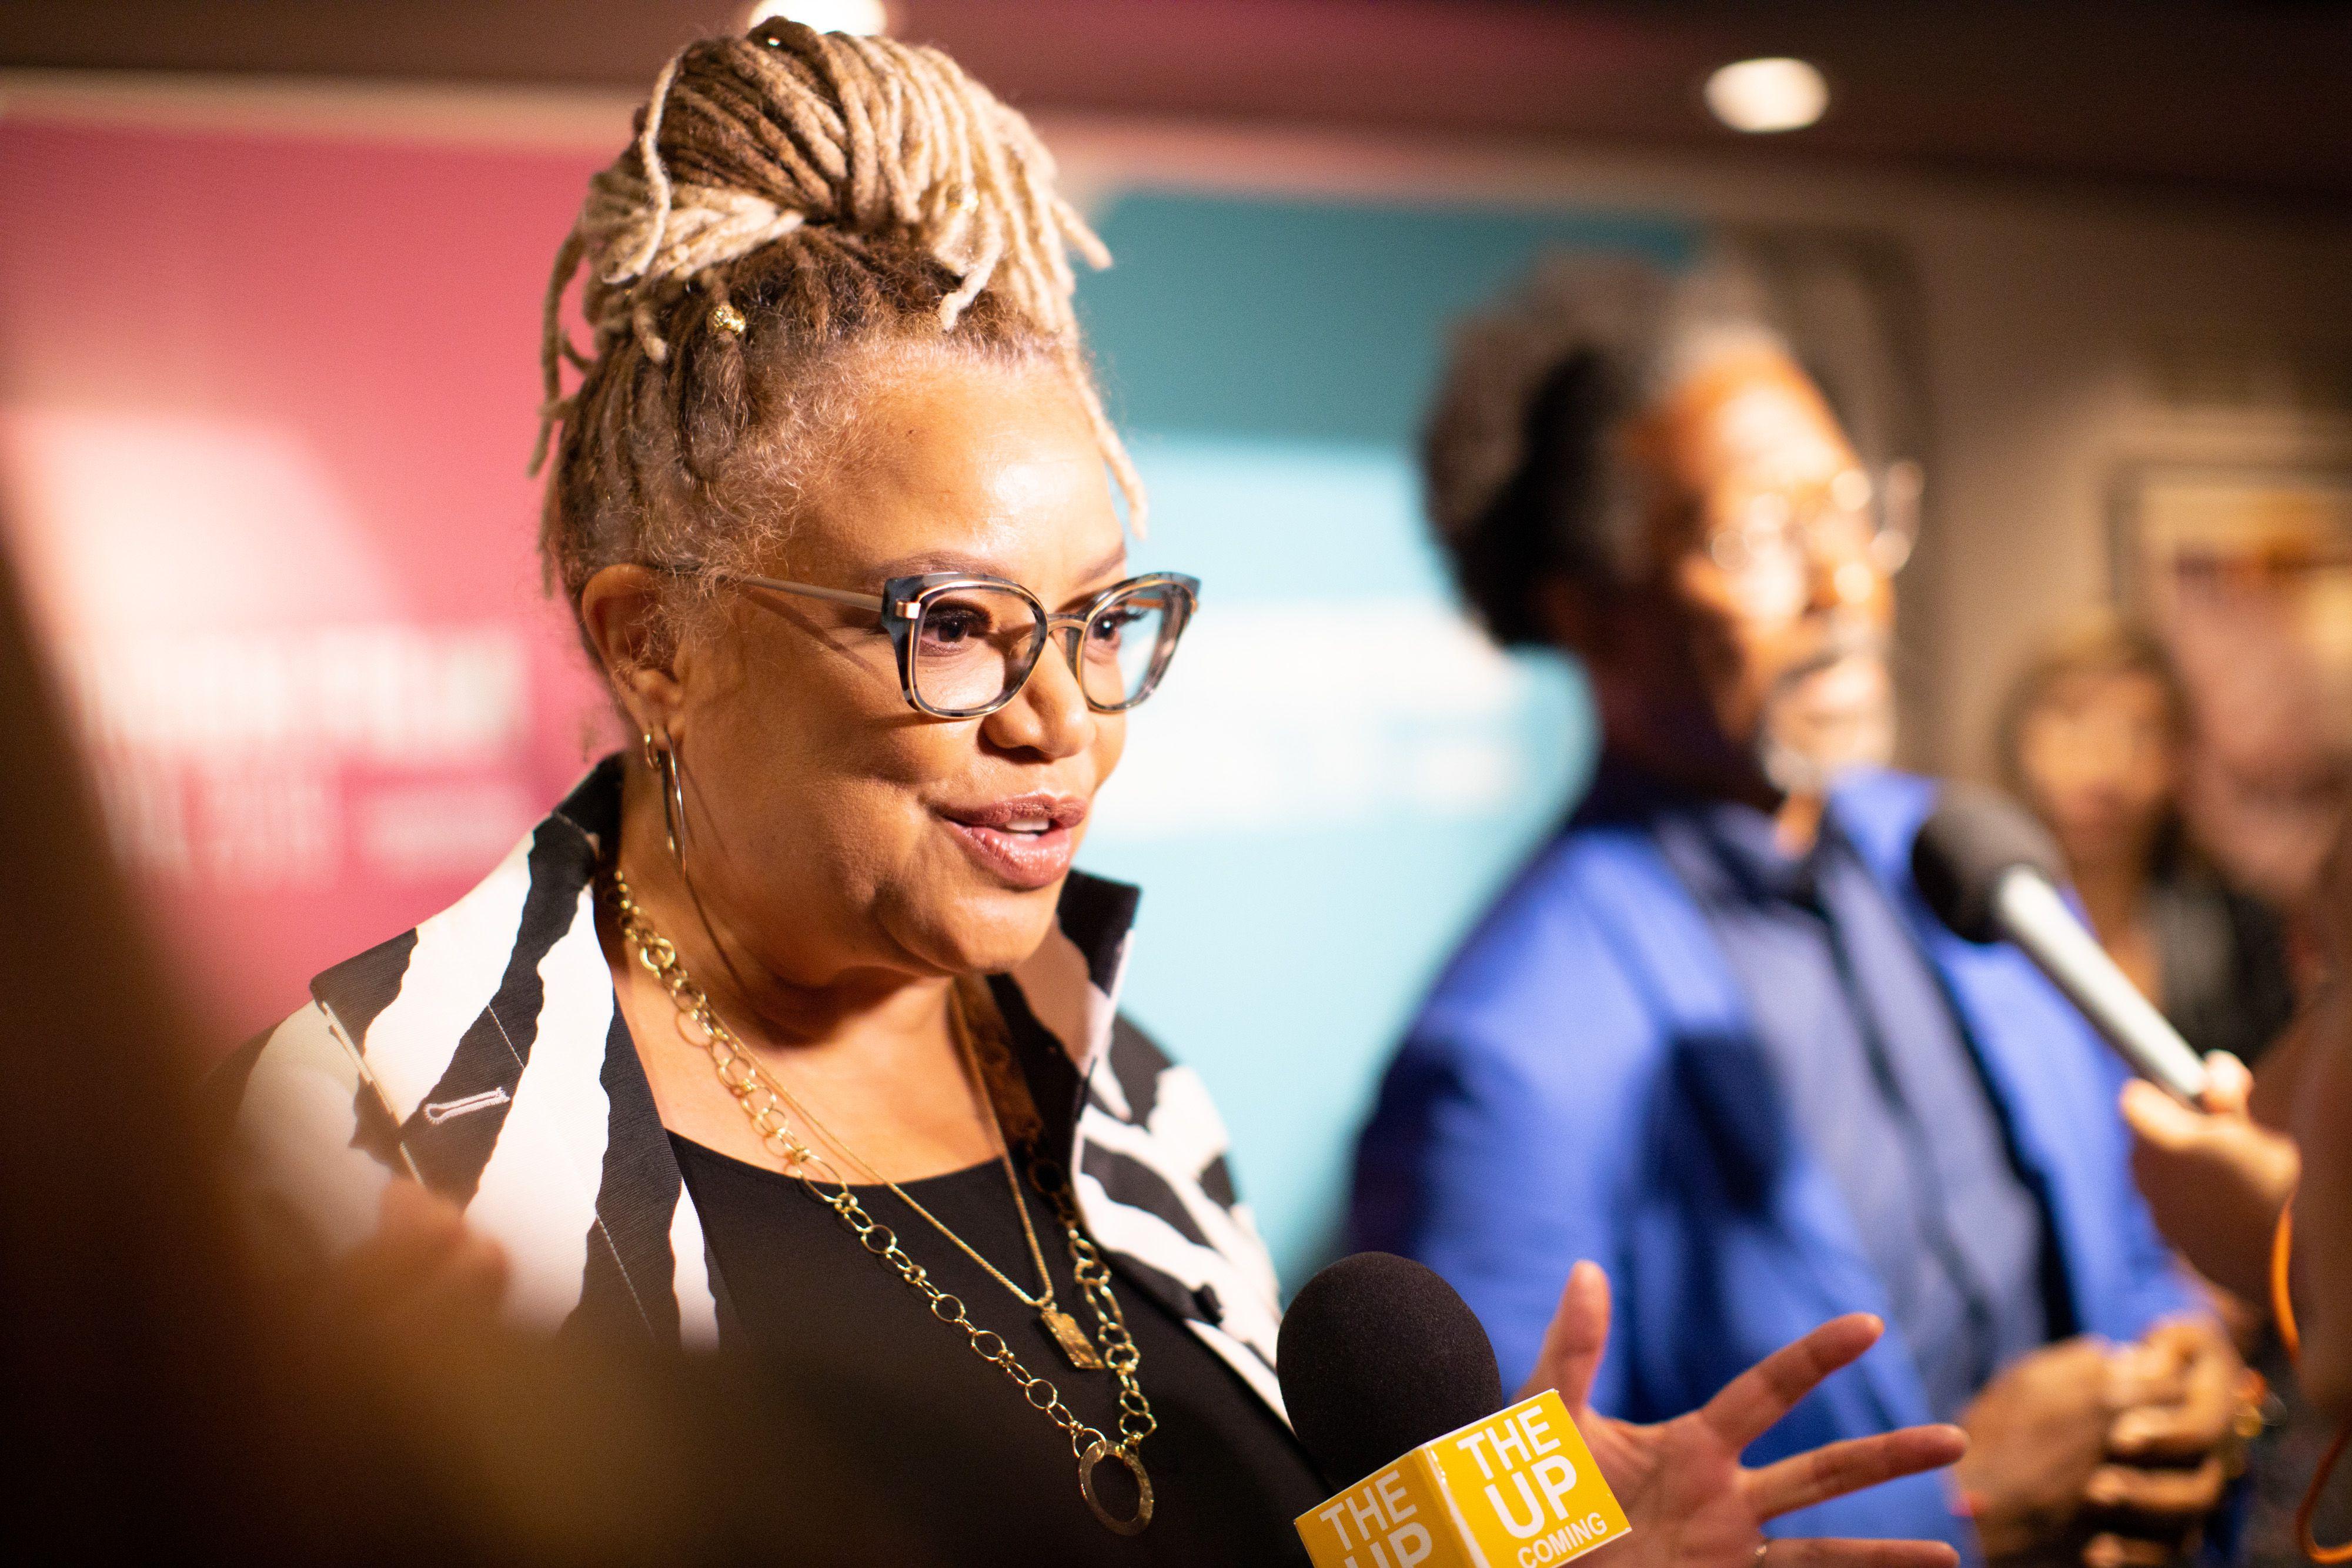 Kasi Lemmons'Harriet', premiere, BFI London Film Festival, UK - 11 Oct 2019